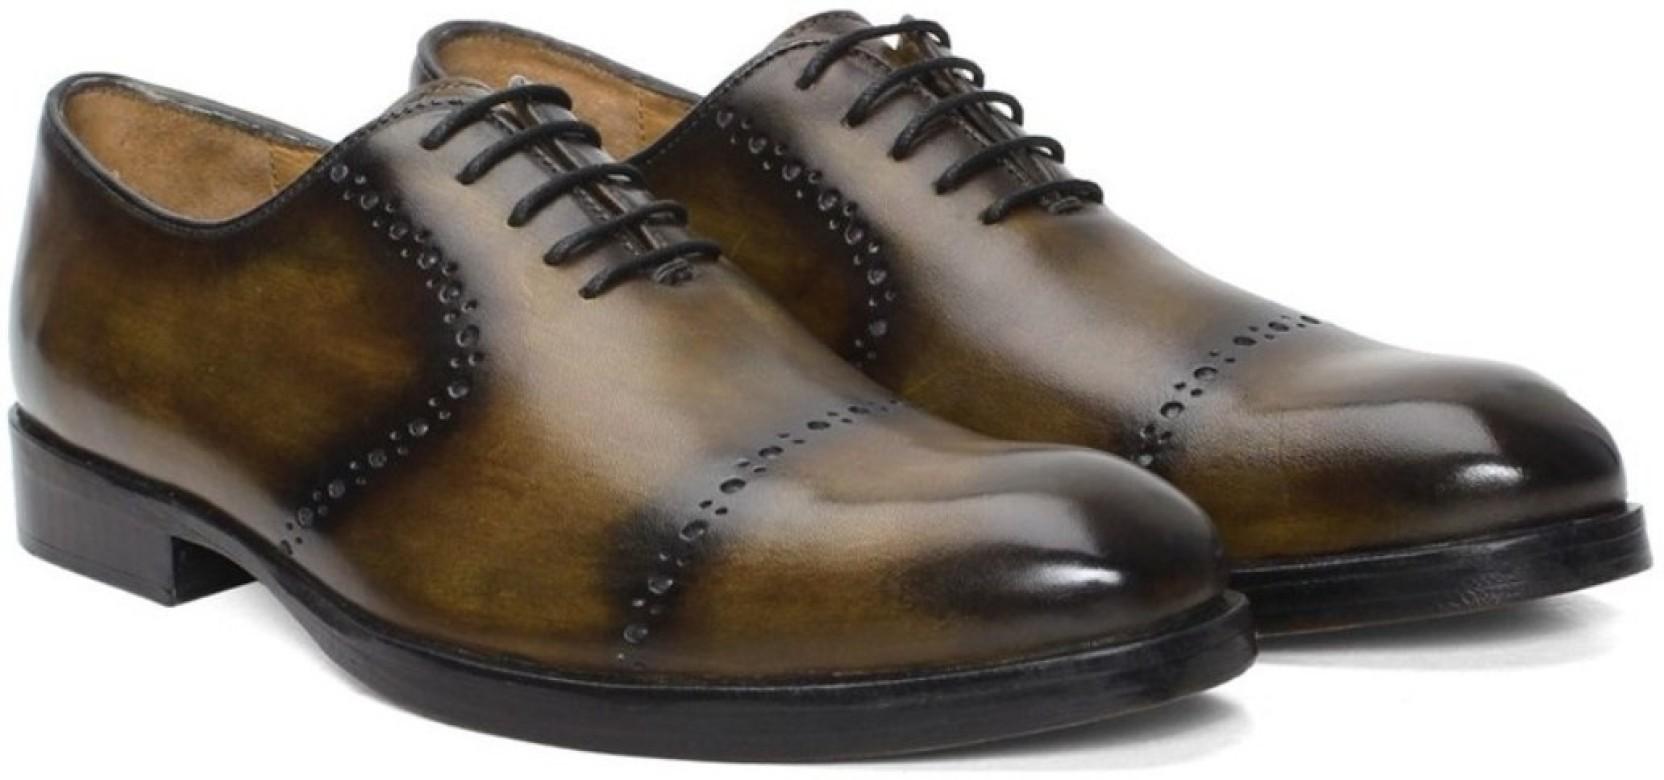 dfc3cd6dfd5 Brune Olive hand painted genuine leather quarter brogue formal shoe Oxford  For Men (Olive